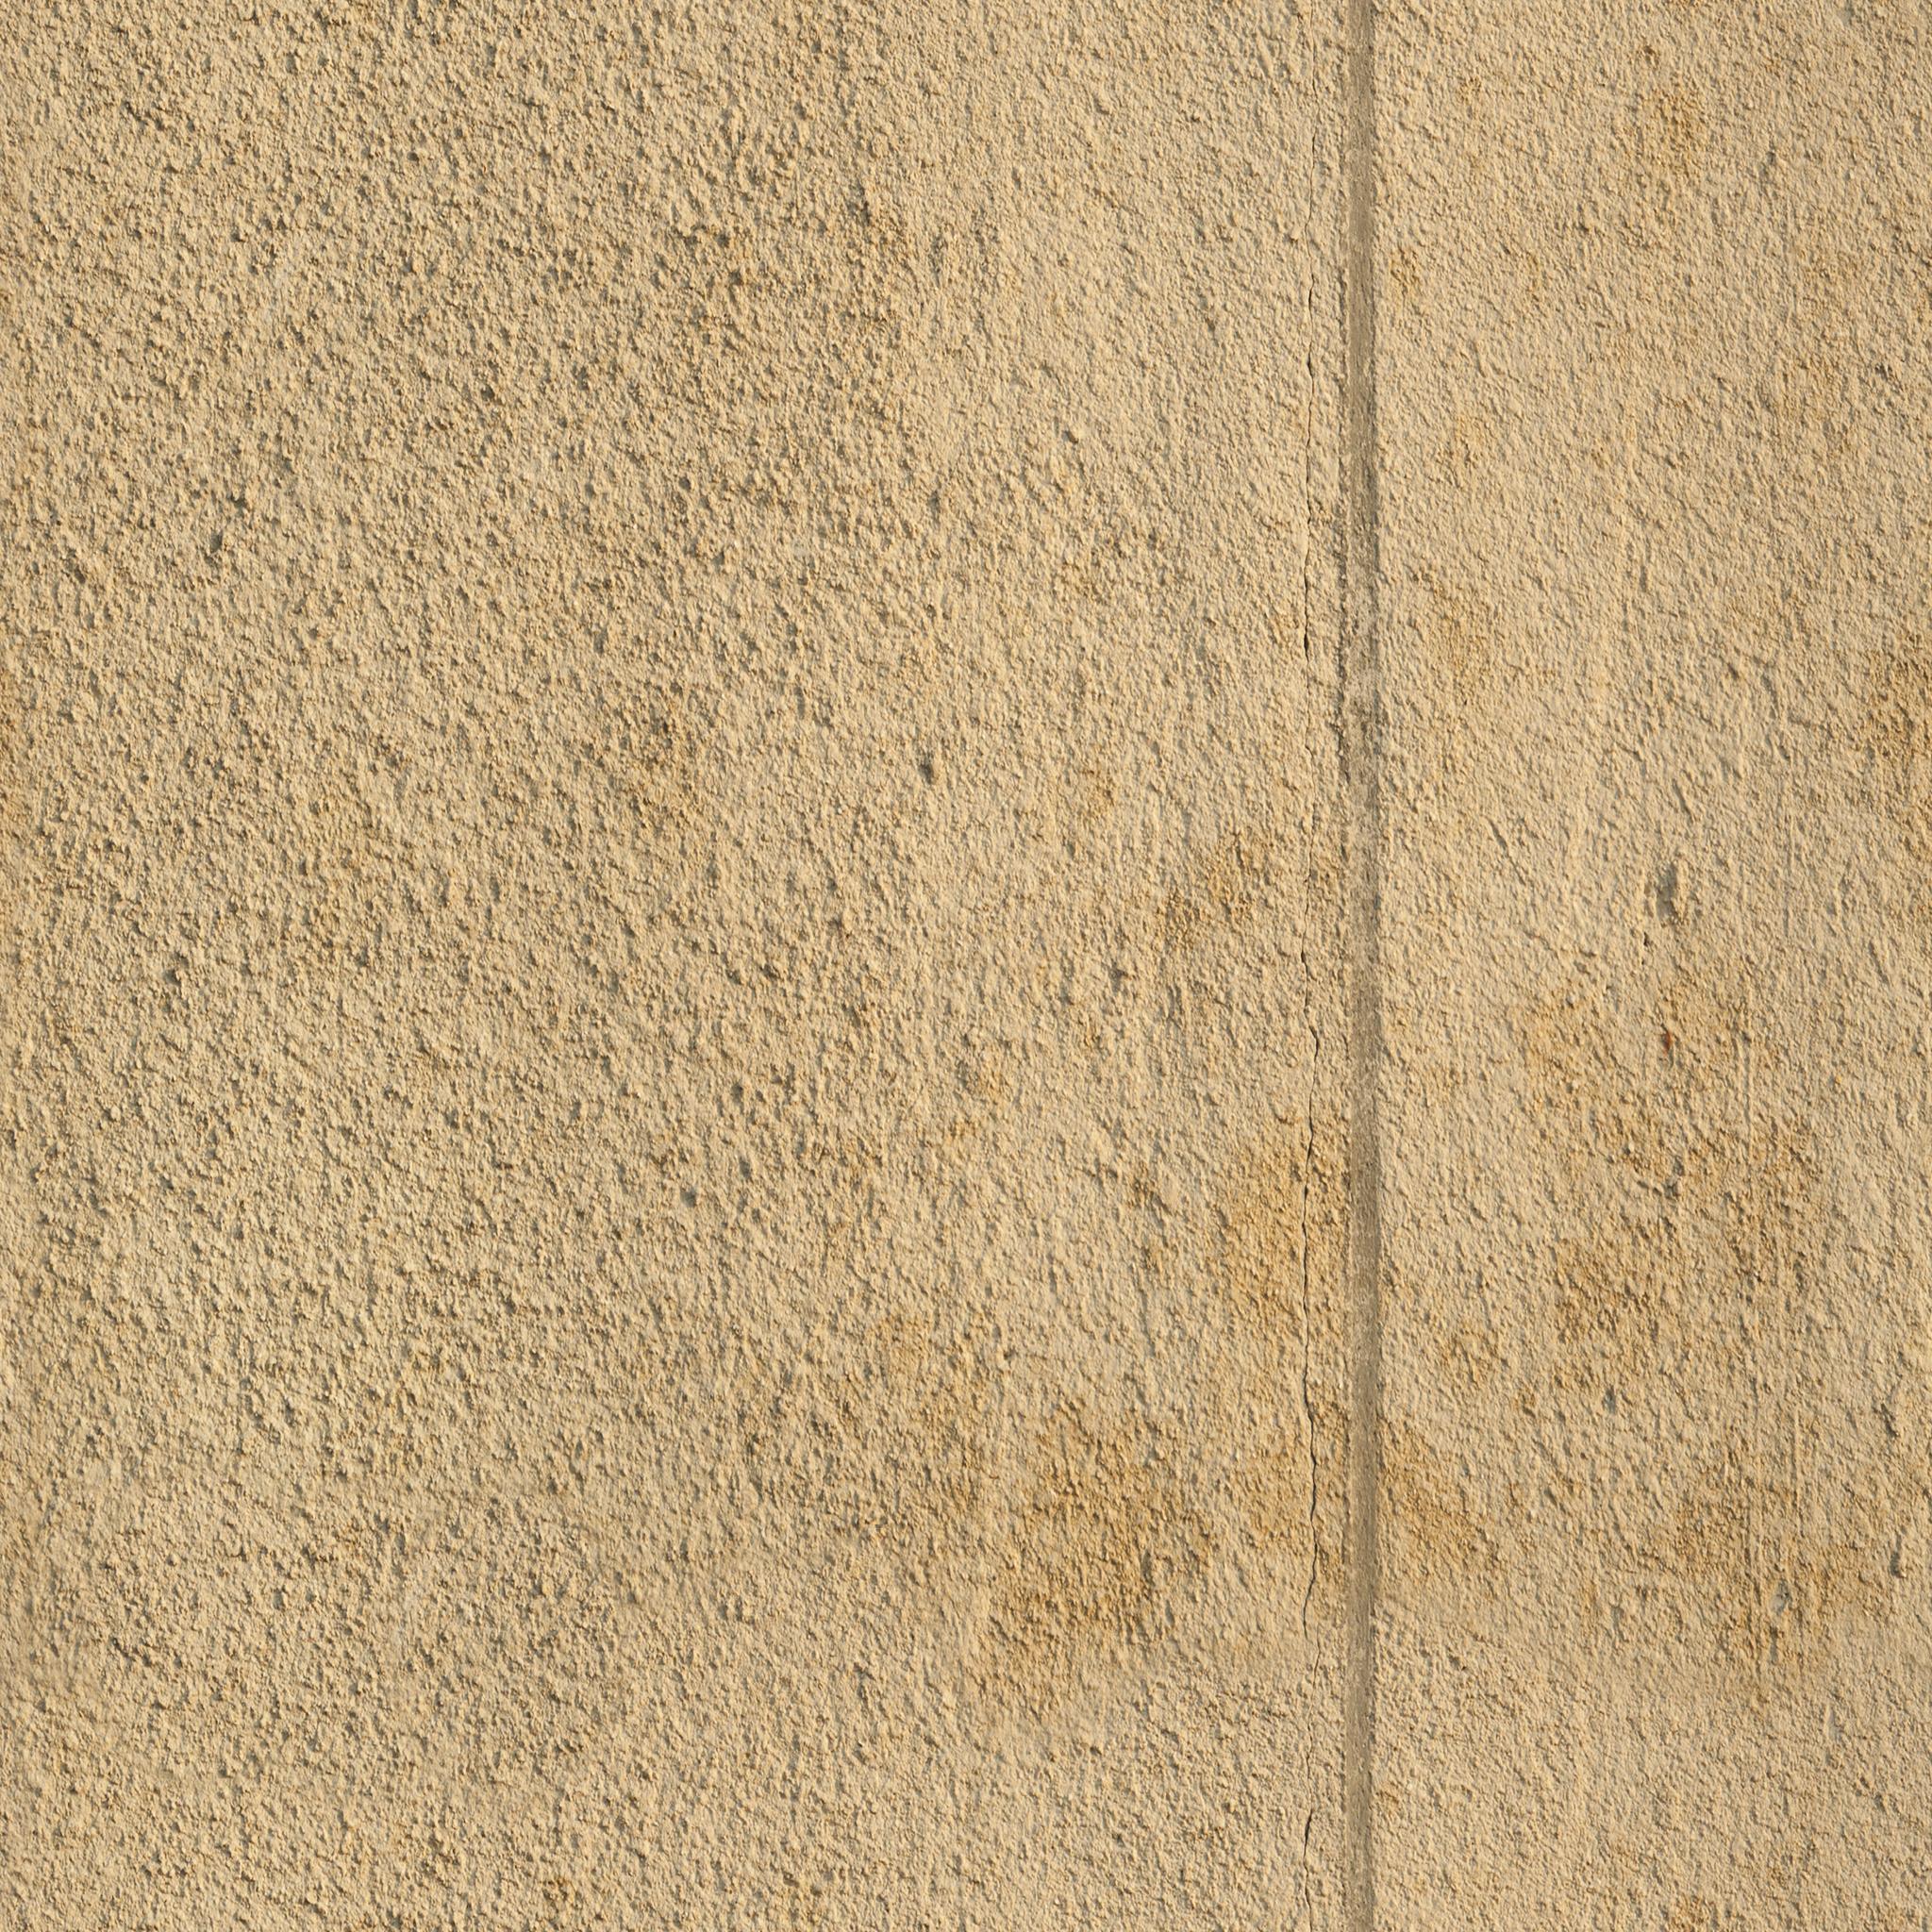 Brown Stucco With Seam.jpg